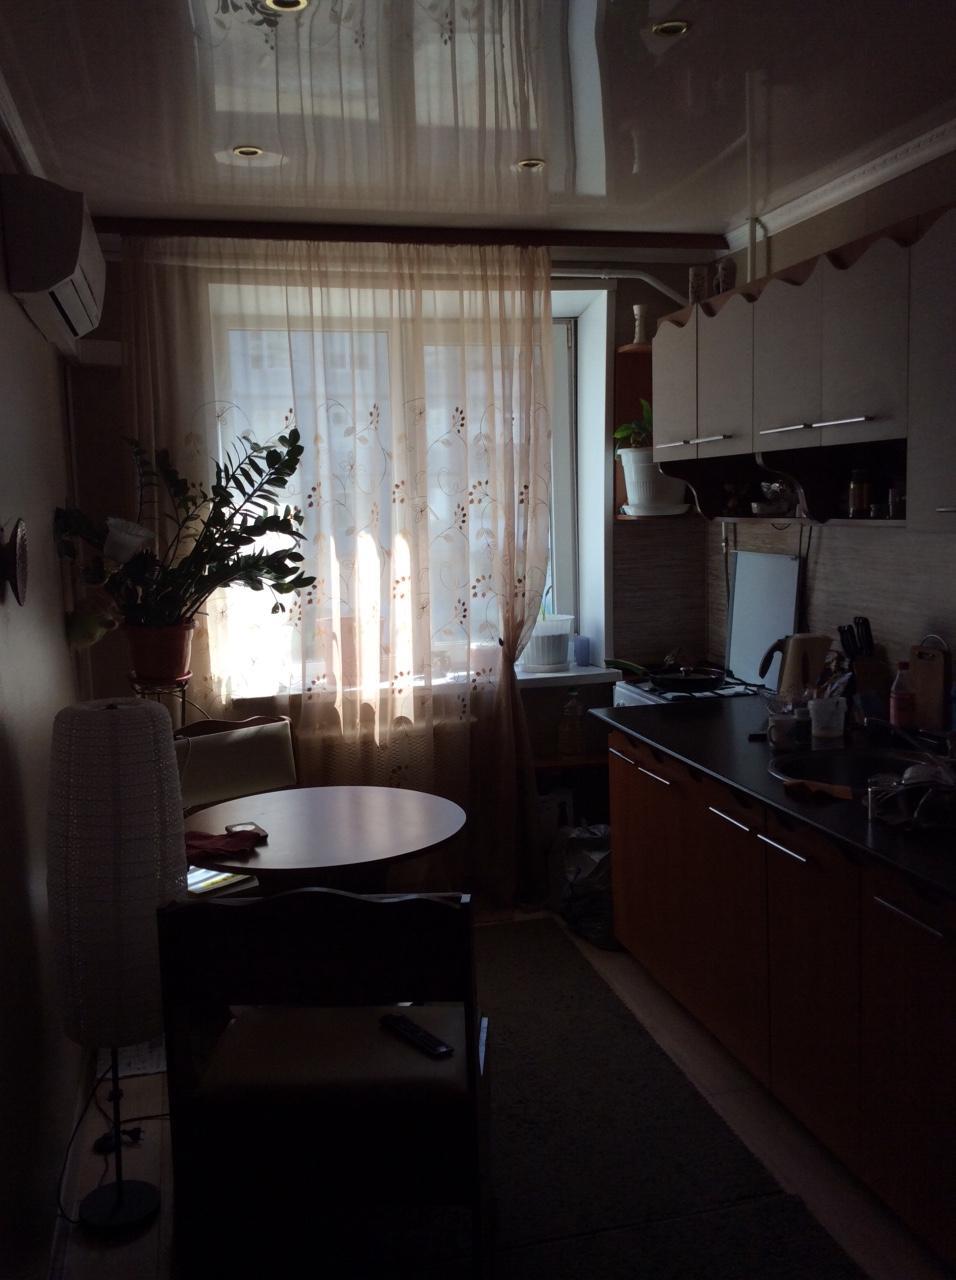 Республика Саха, Якутск, ул. Петра Алексеева, 21/3